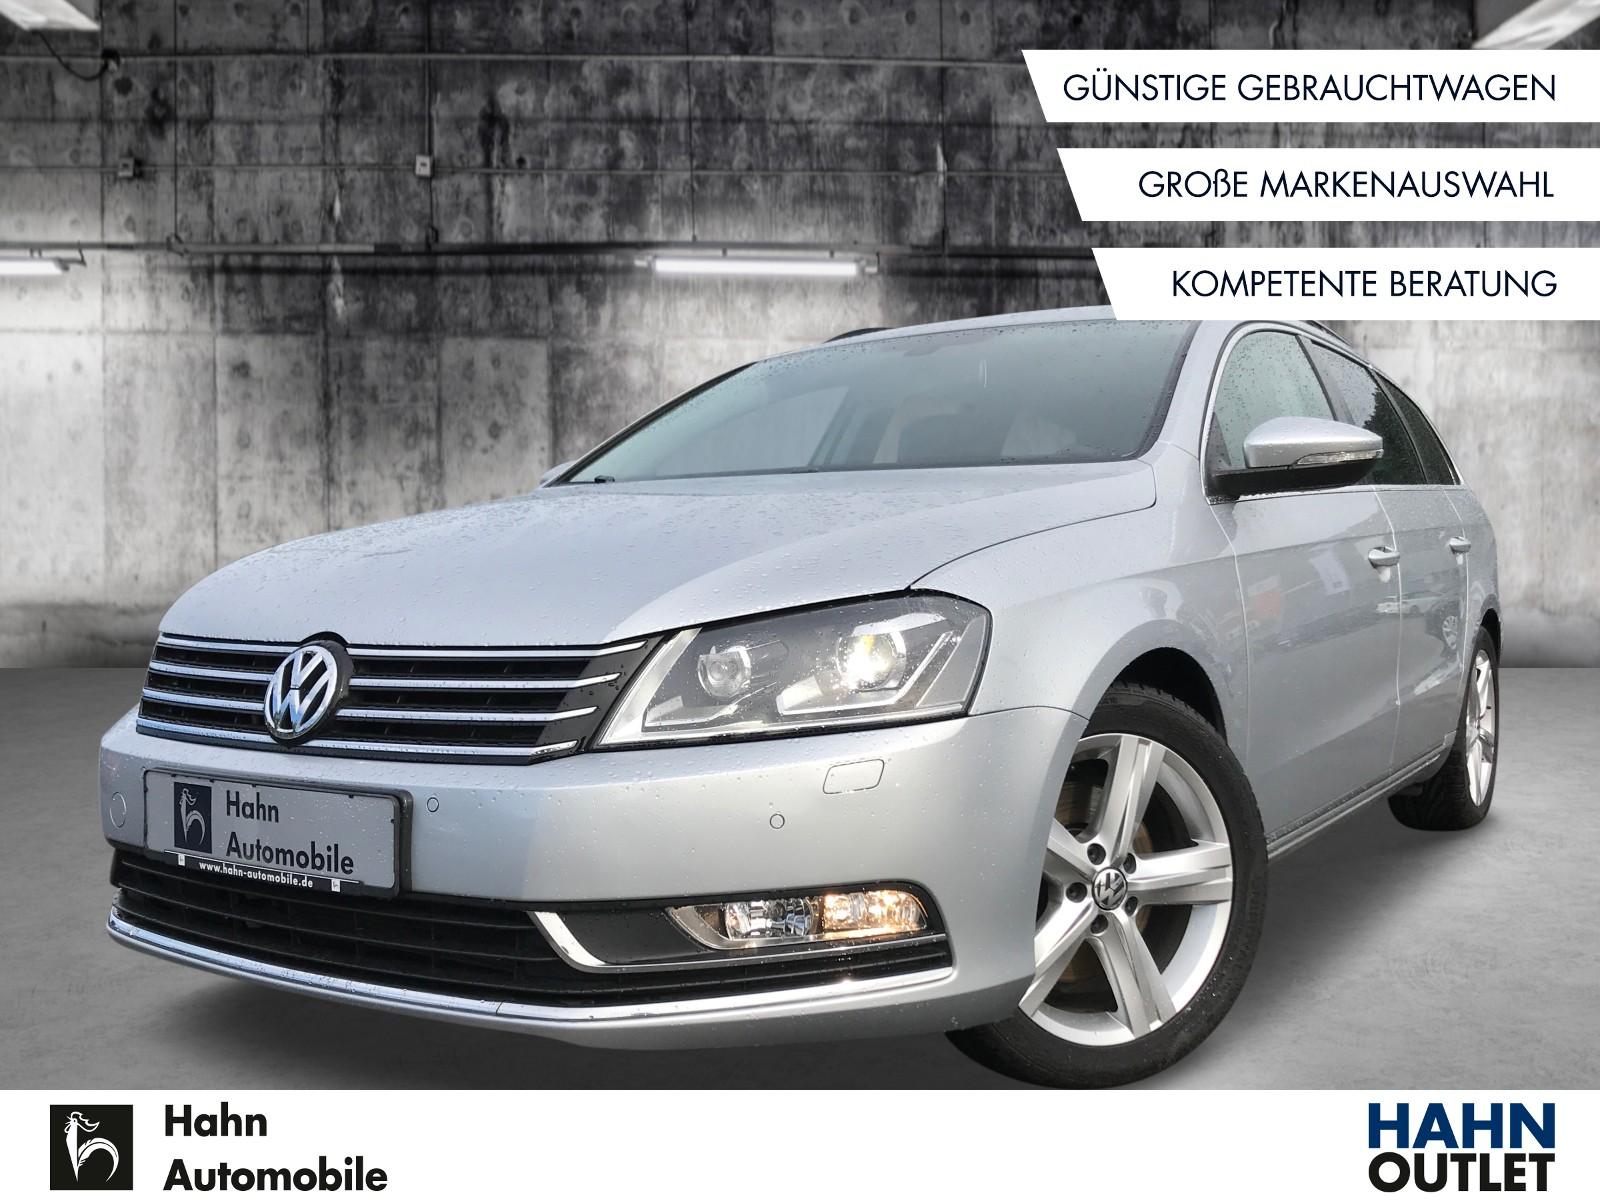 Volkswagen Passat Variant 1.4 TSI Comfortline Xenon PDC GRA, Jahr 2014, Benzin